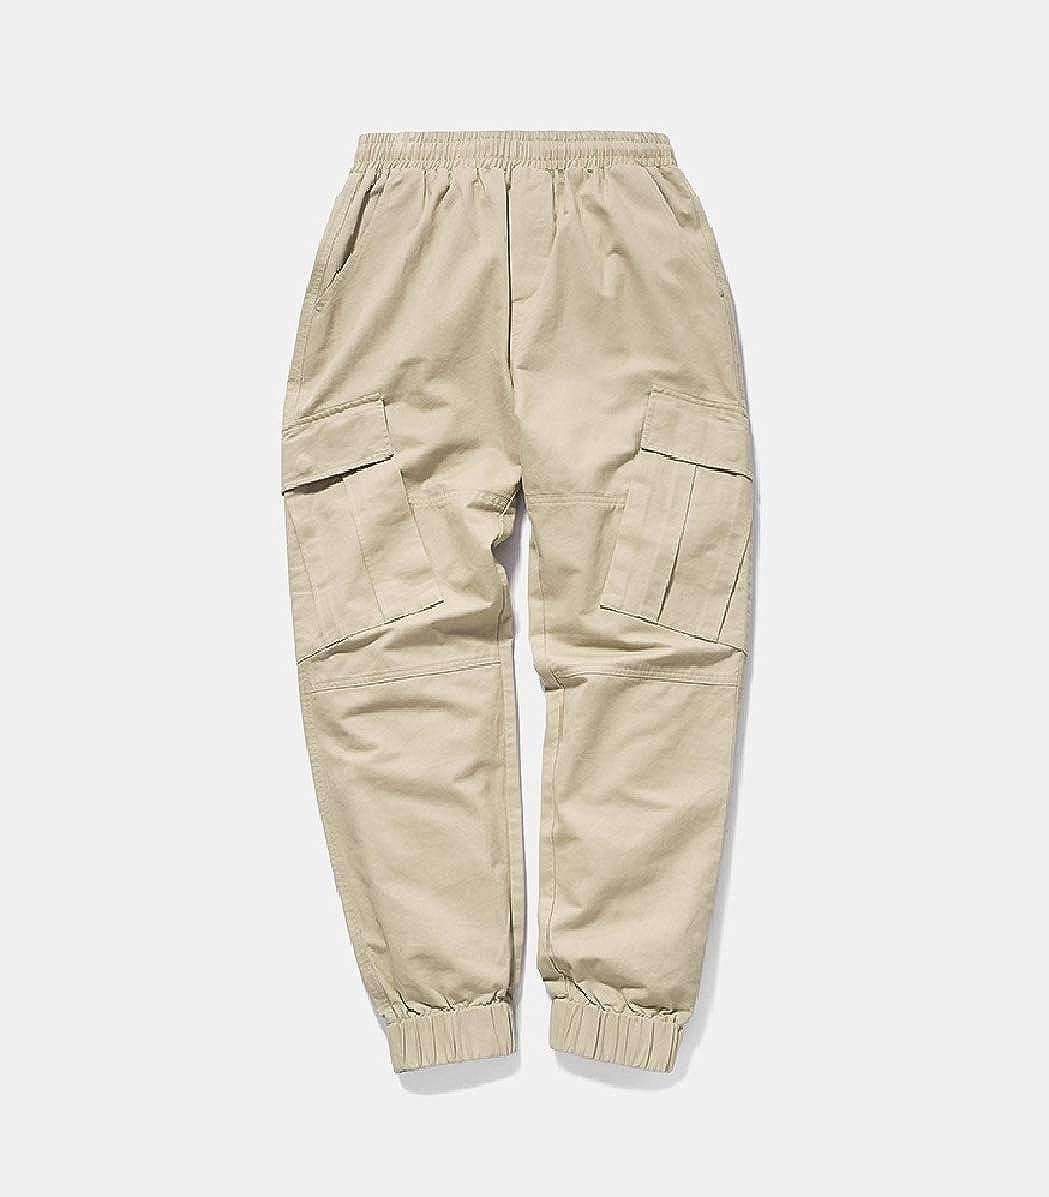 CuteRose Men Beam Foot Trousers Athletic-Fit Back Cotton Tenths Pants